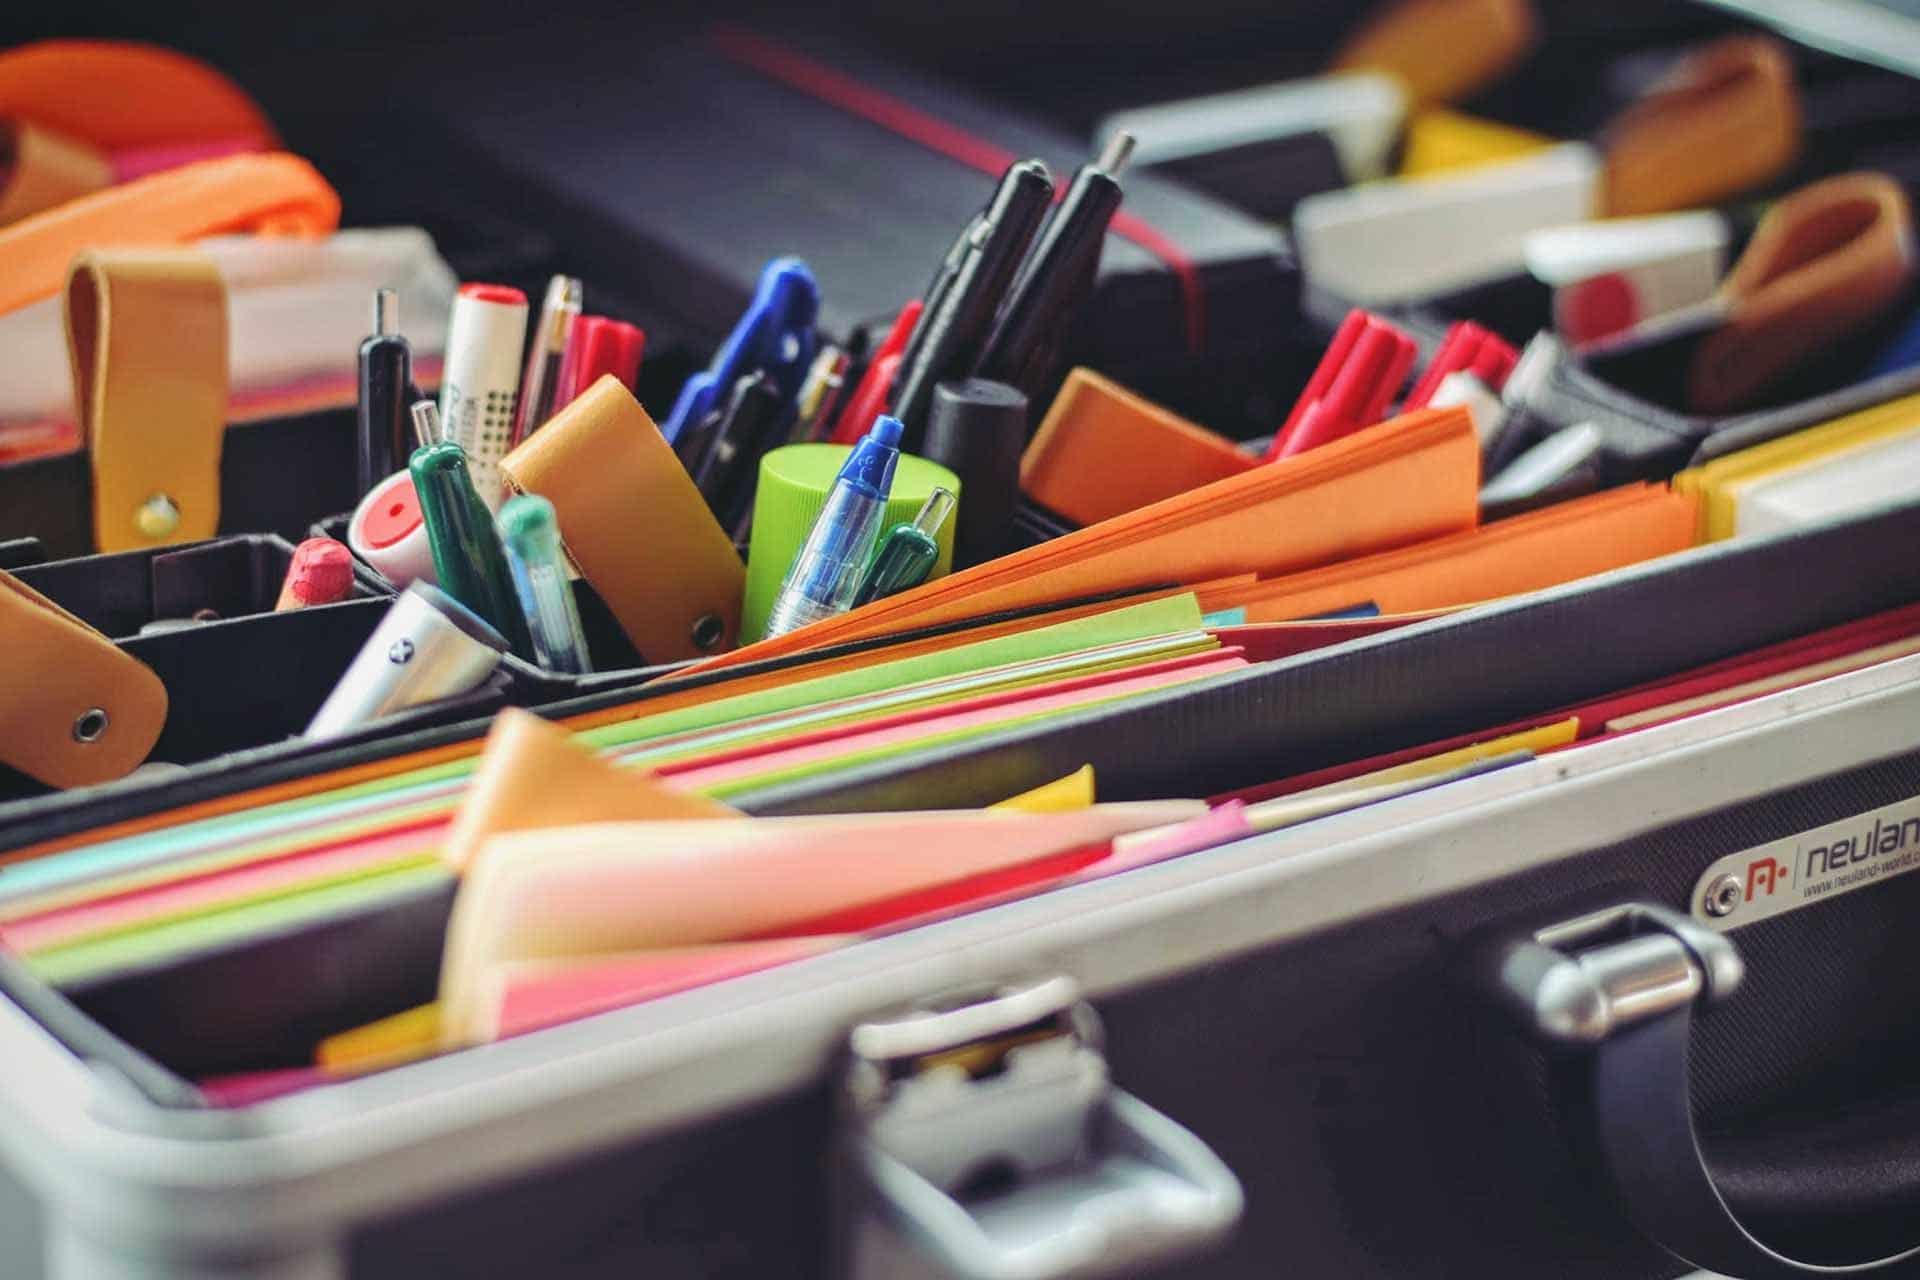 t2informatik Blog: Creativity in meetings - a comparison of methods